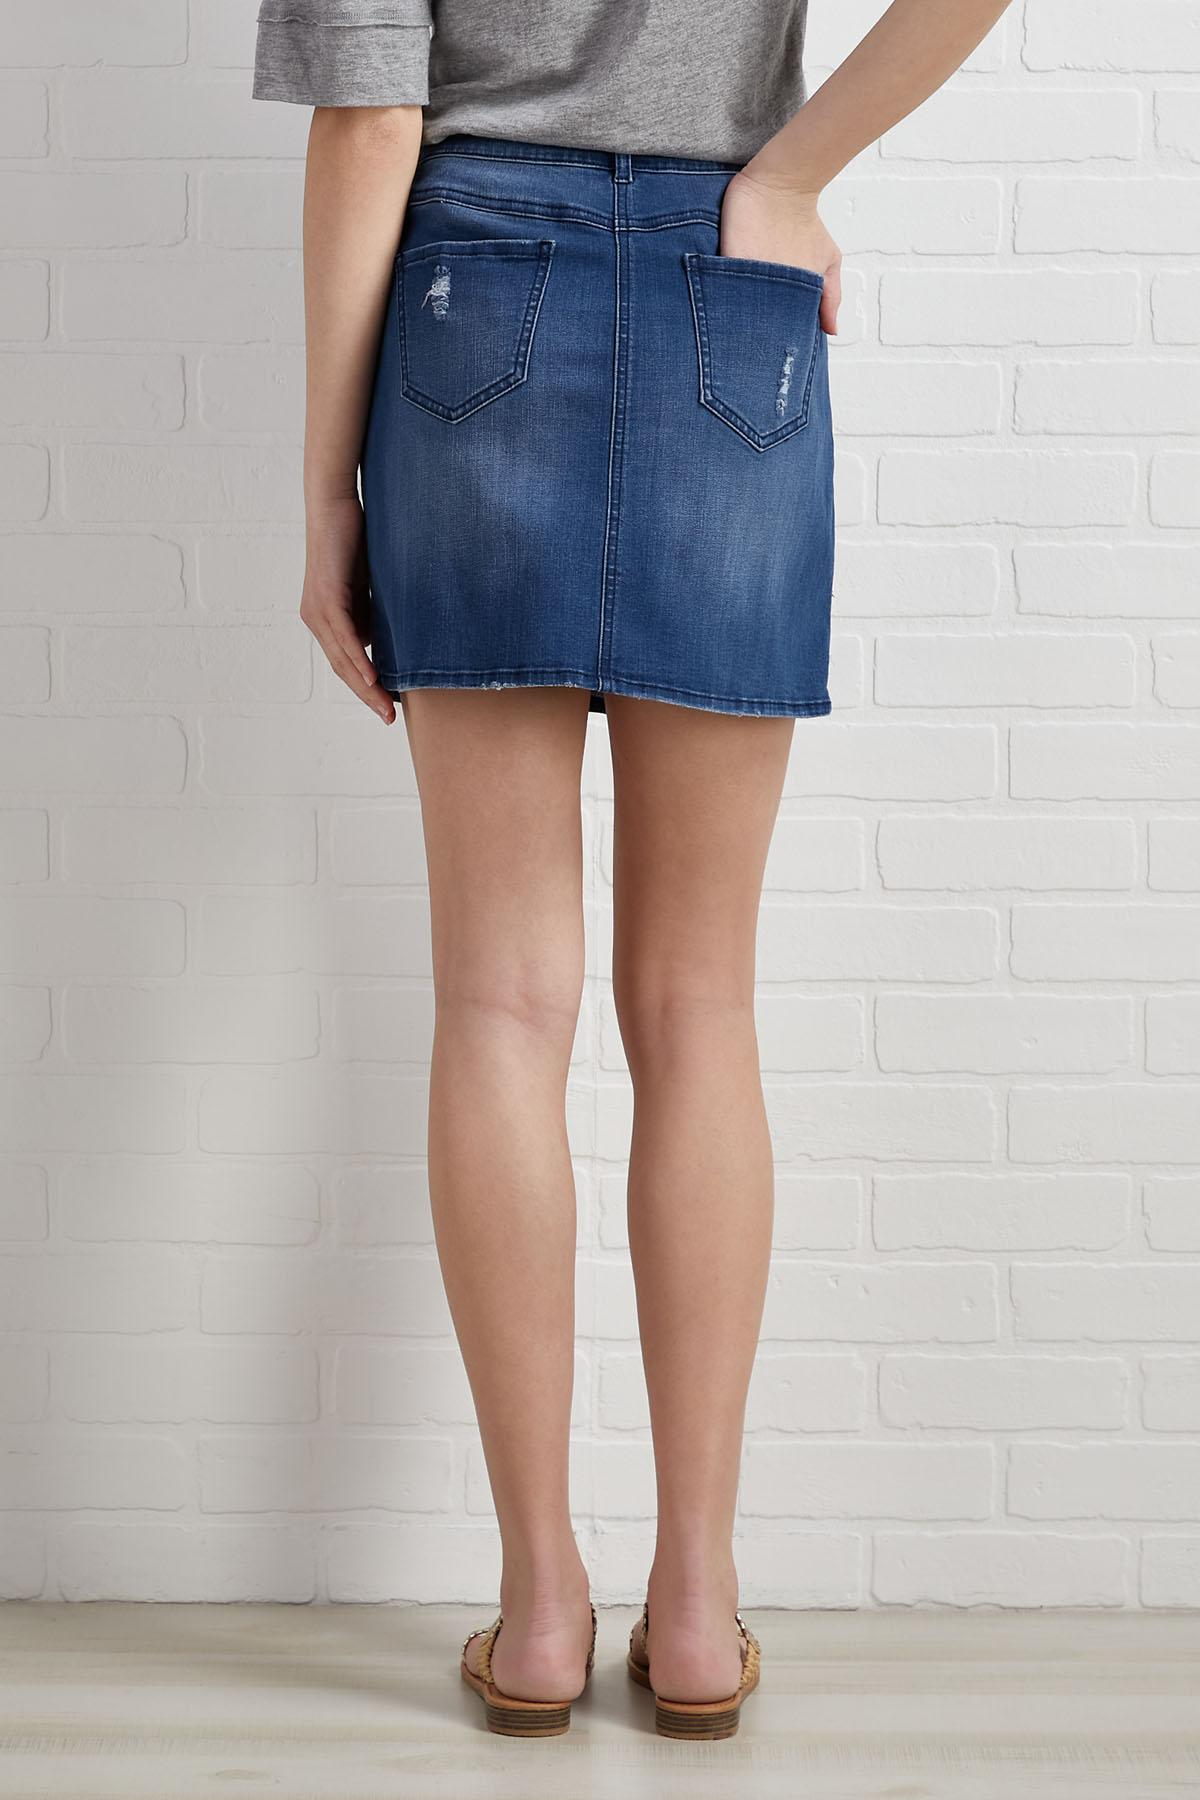 Give Me Mini Skirt